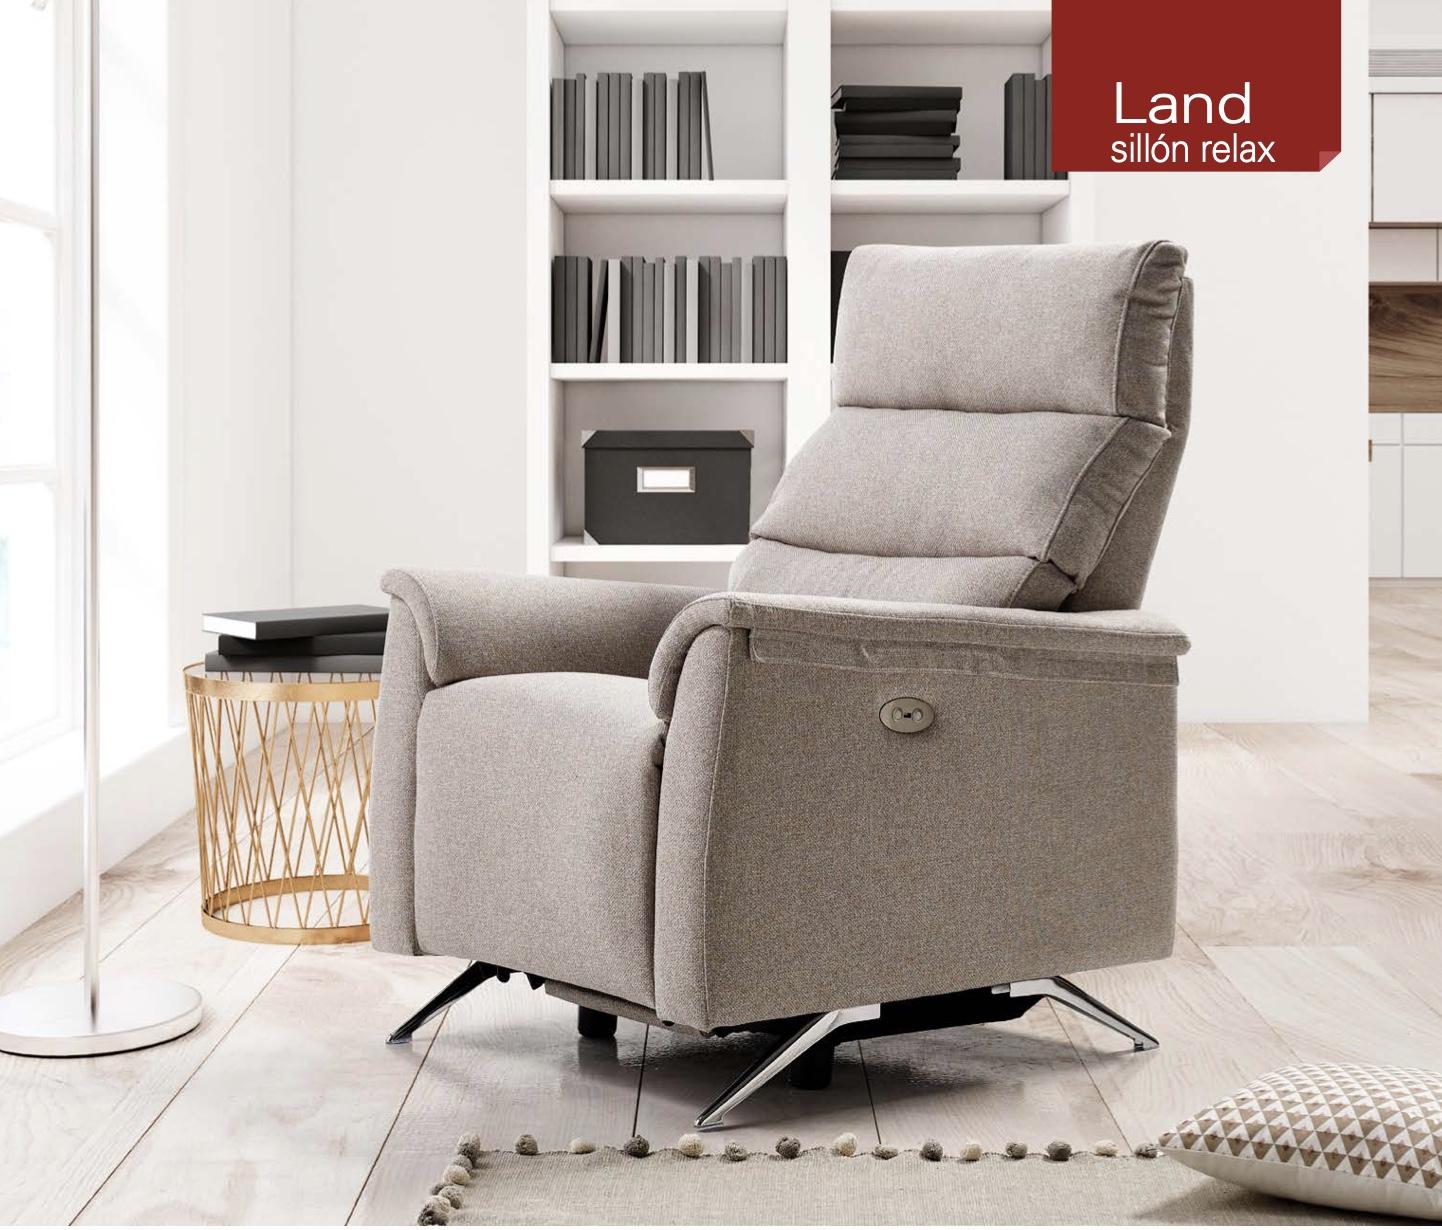 CLD-Land